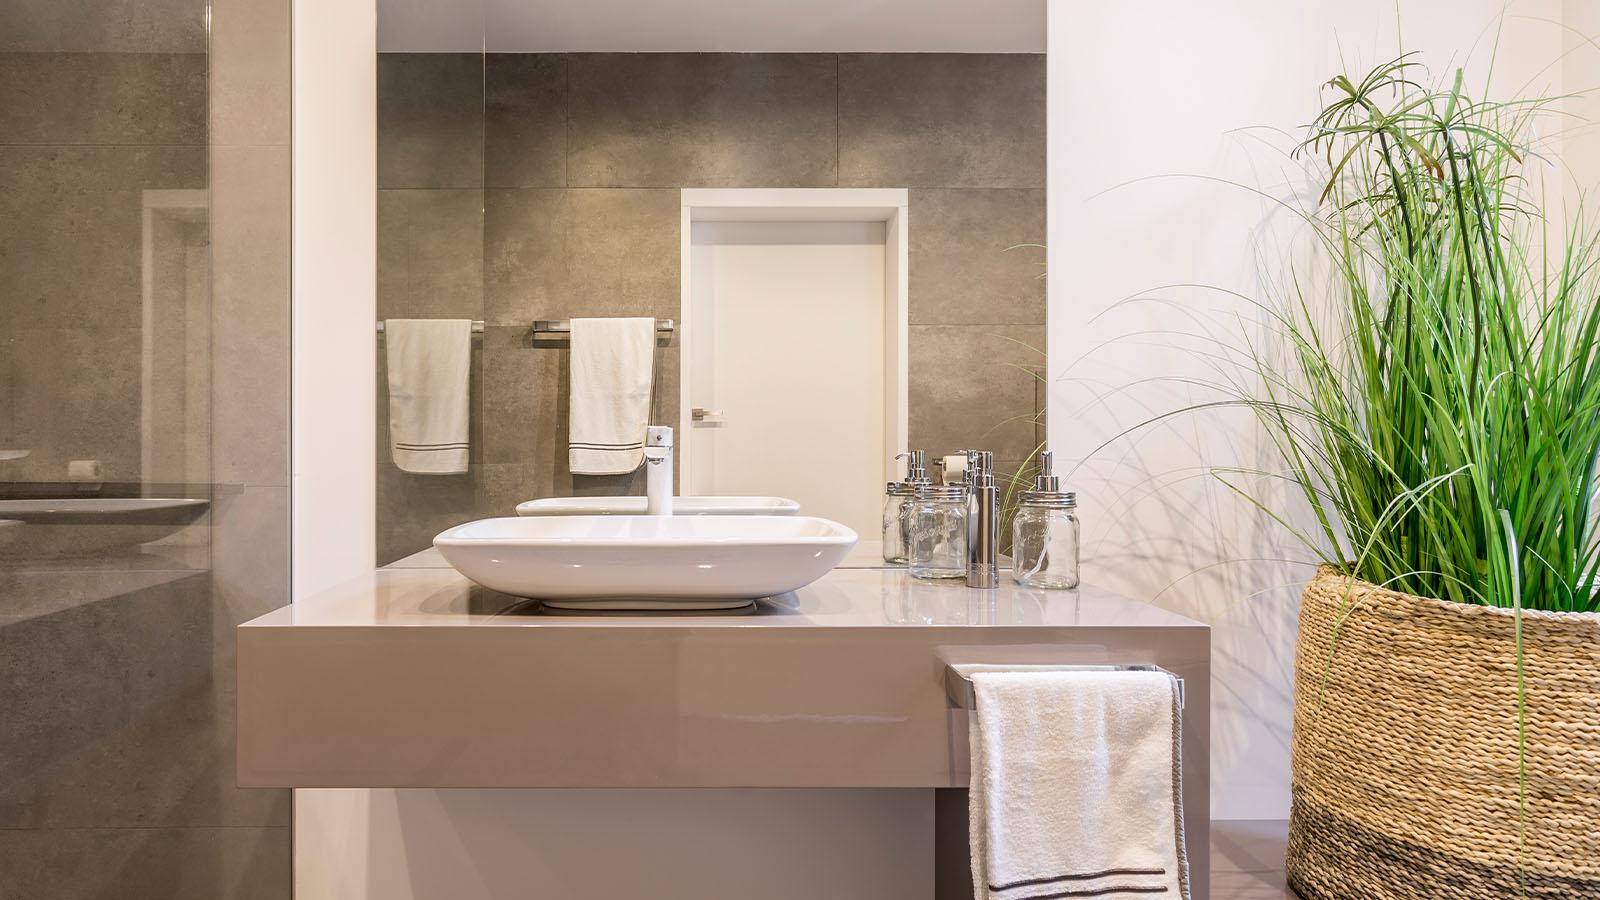 Rechteckiger Spiegel in modernem Badezimmer